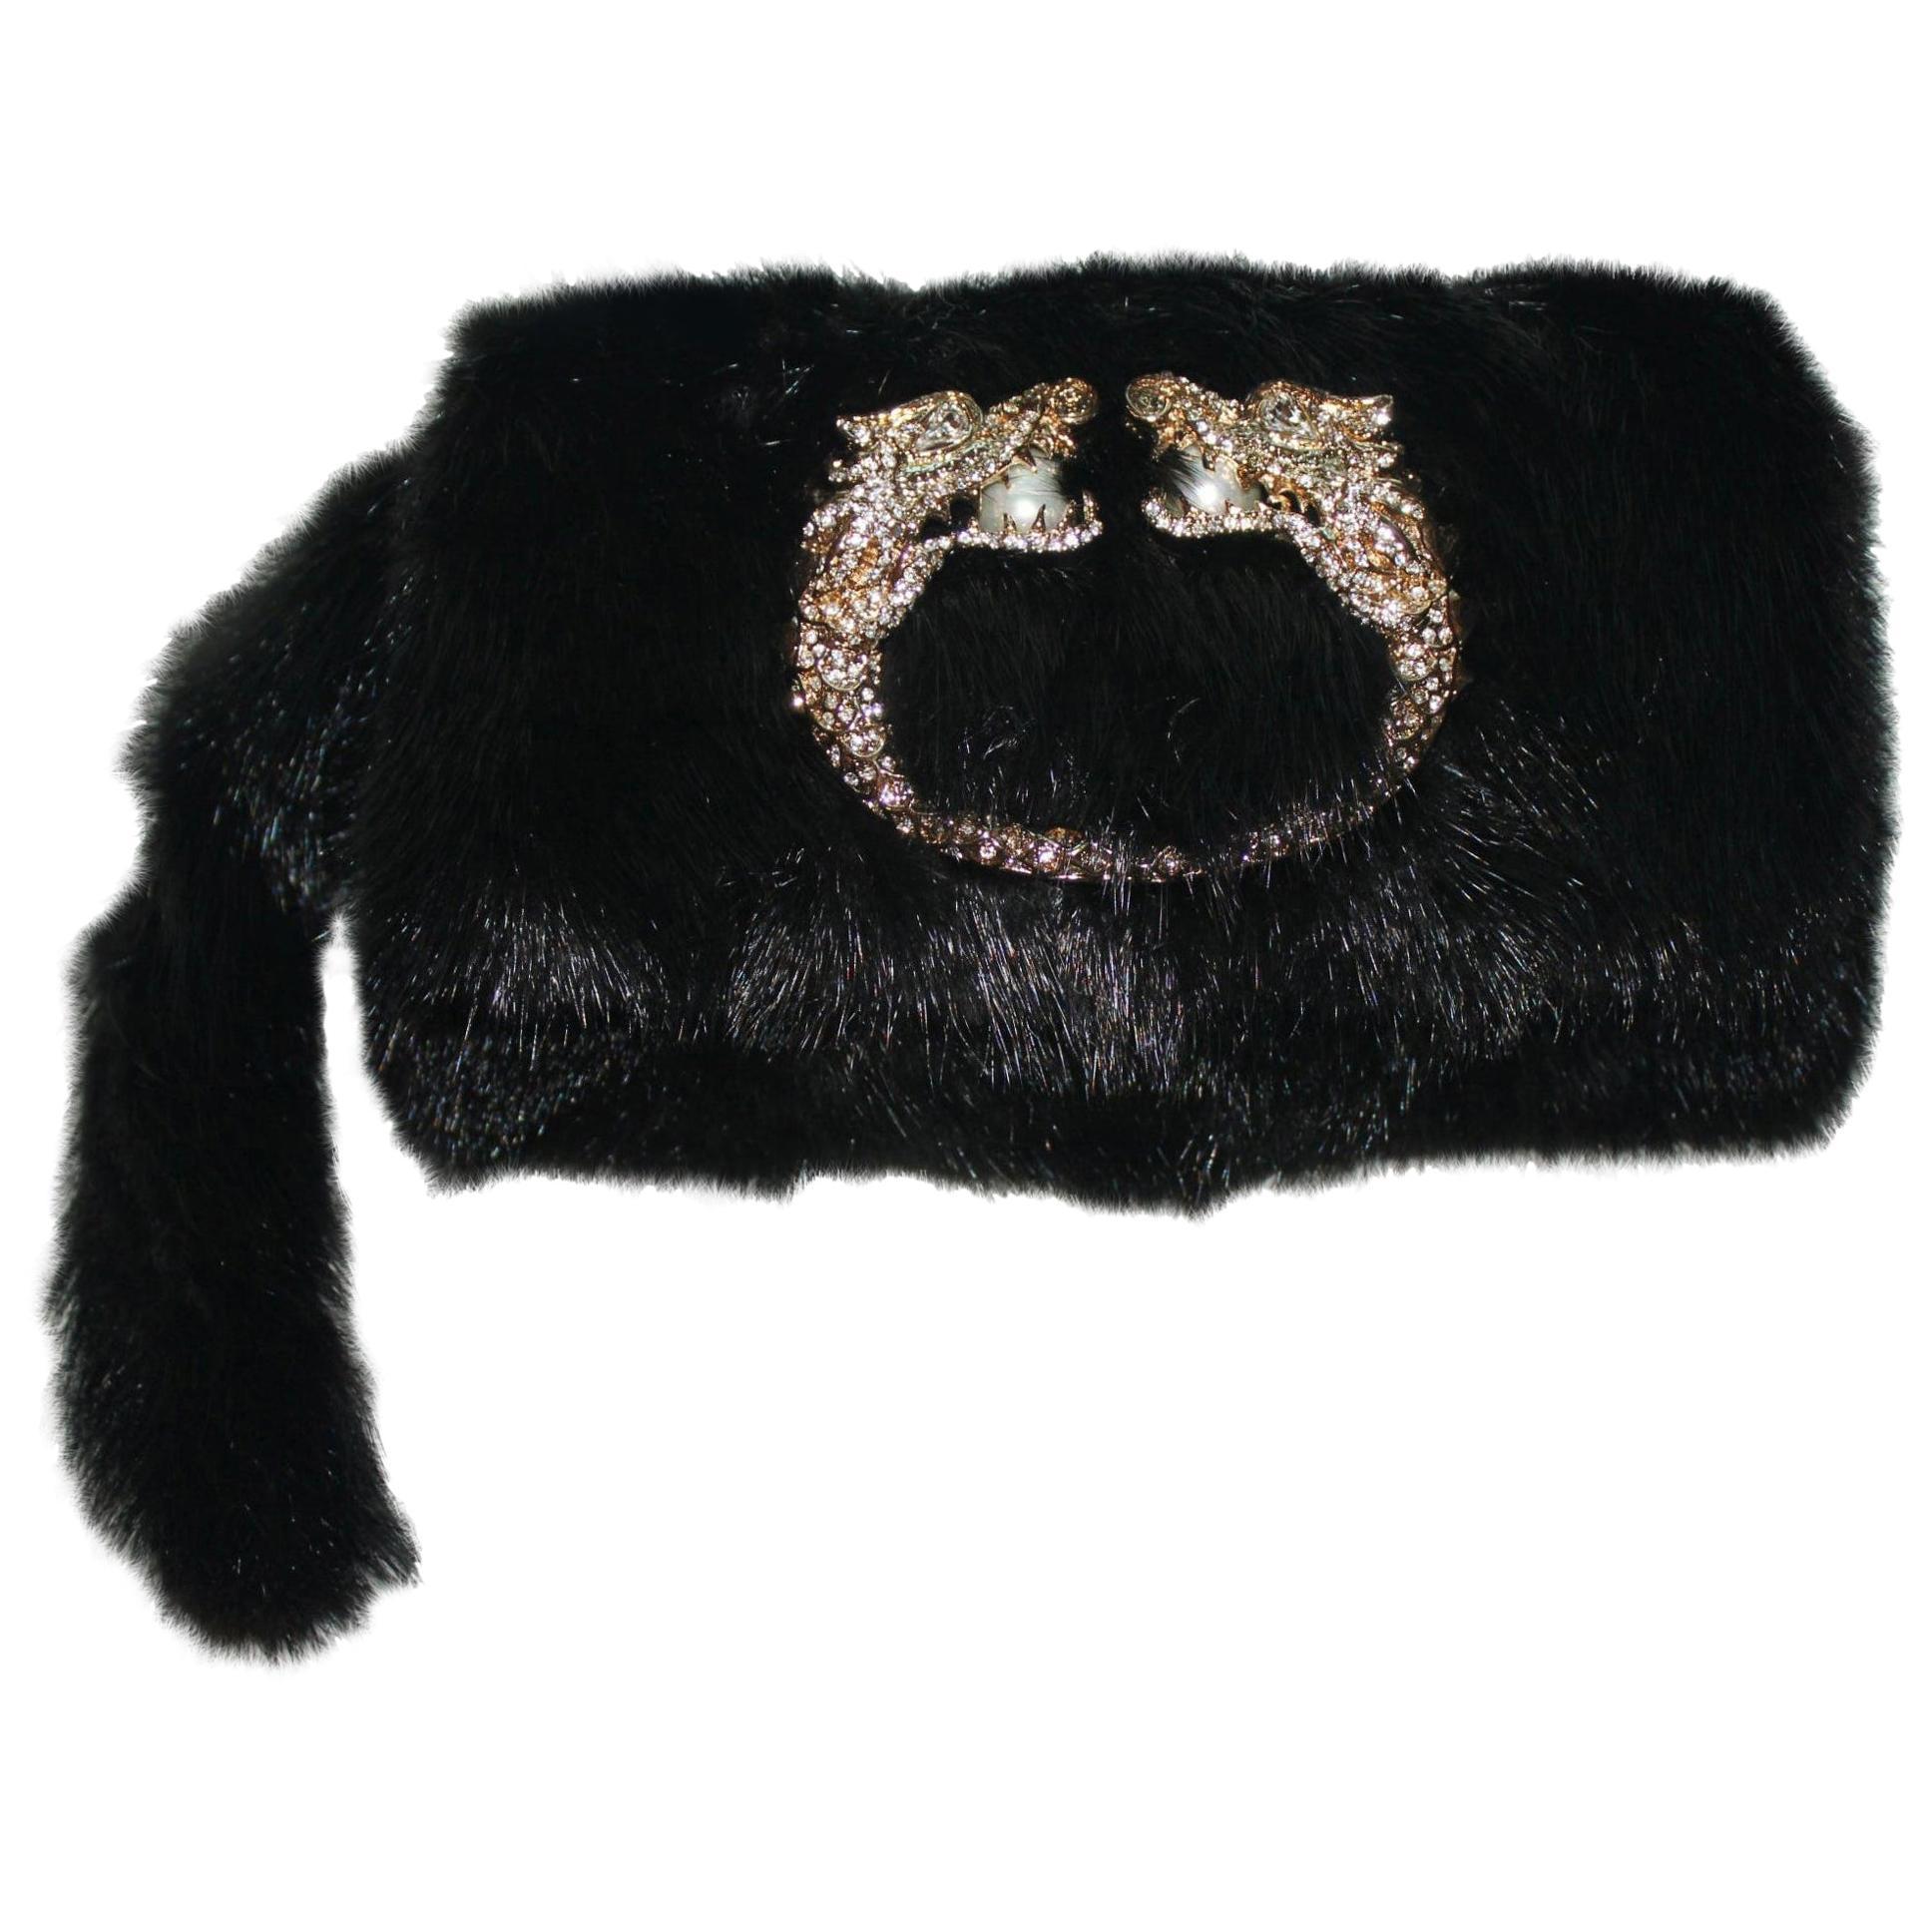 NEW Gucci by Tom Ford Black Dragon Pearl Jeweled Mink Fur Evening Bag Clutch